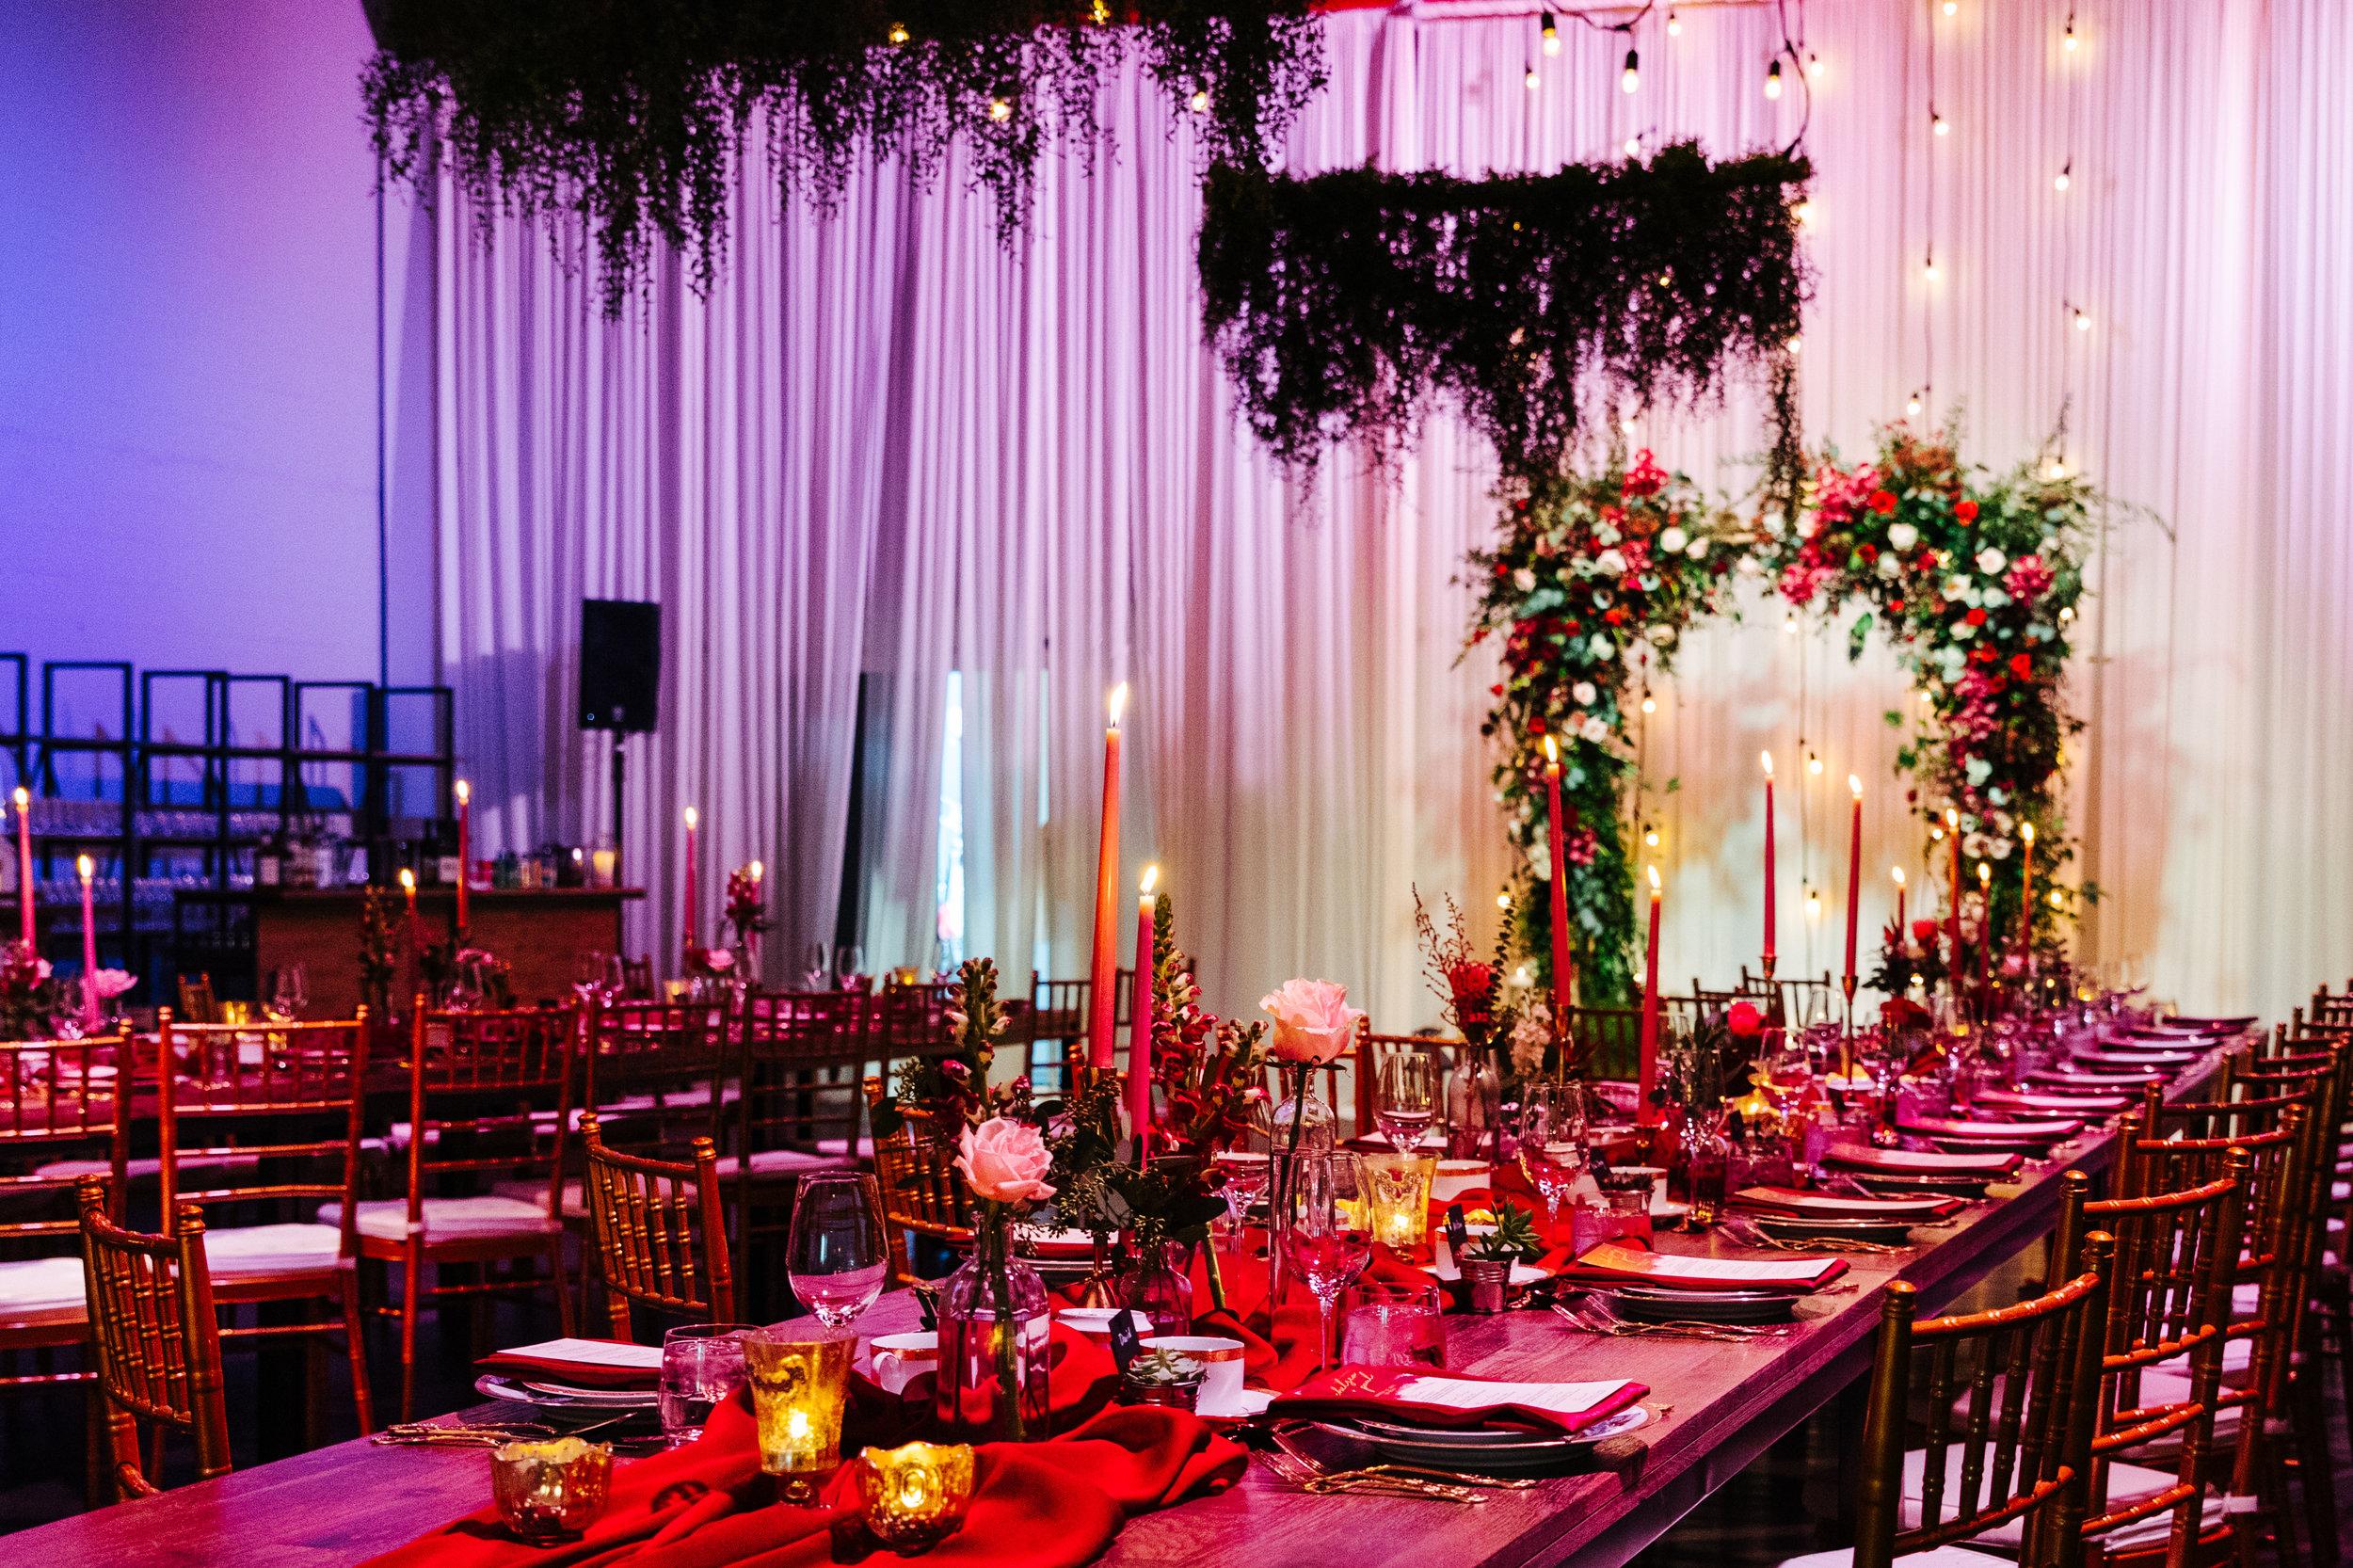 herastudios_event_bride_groom_hera_selects-9.jpg